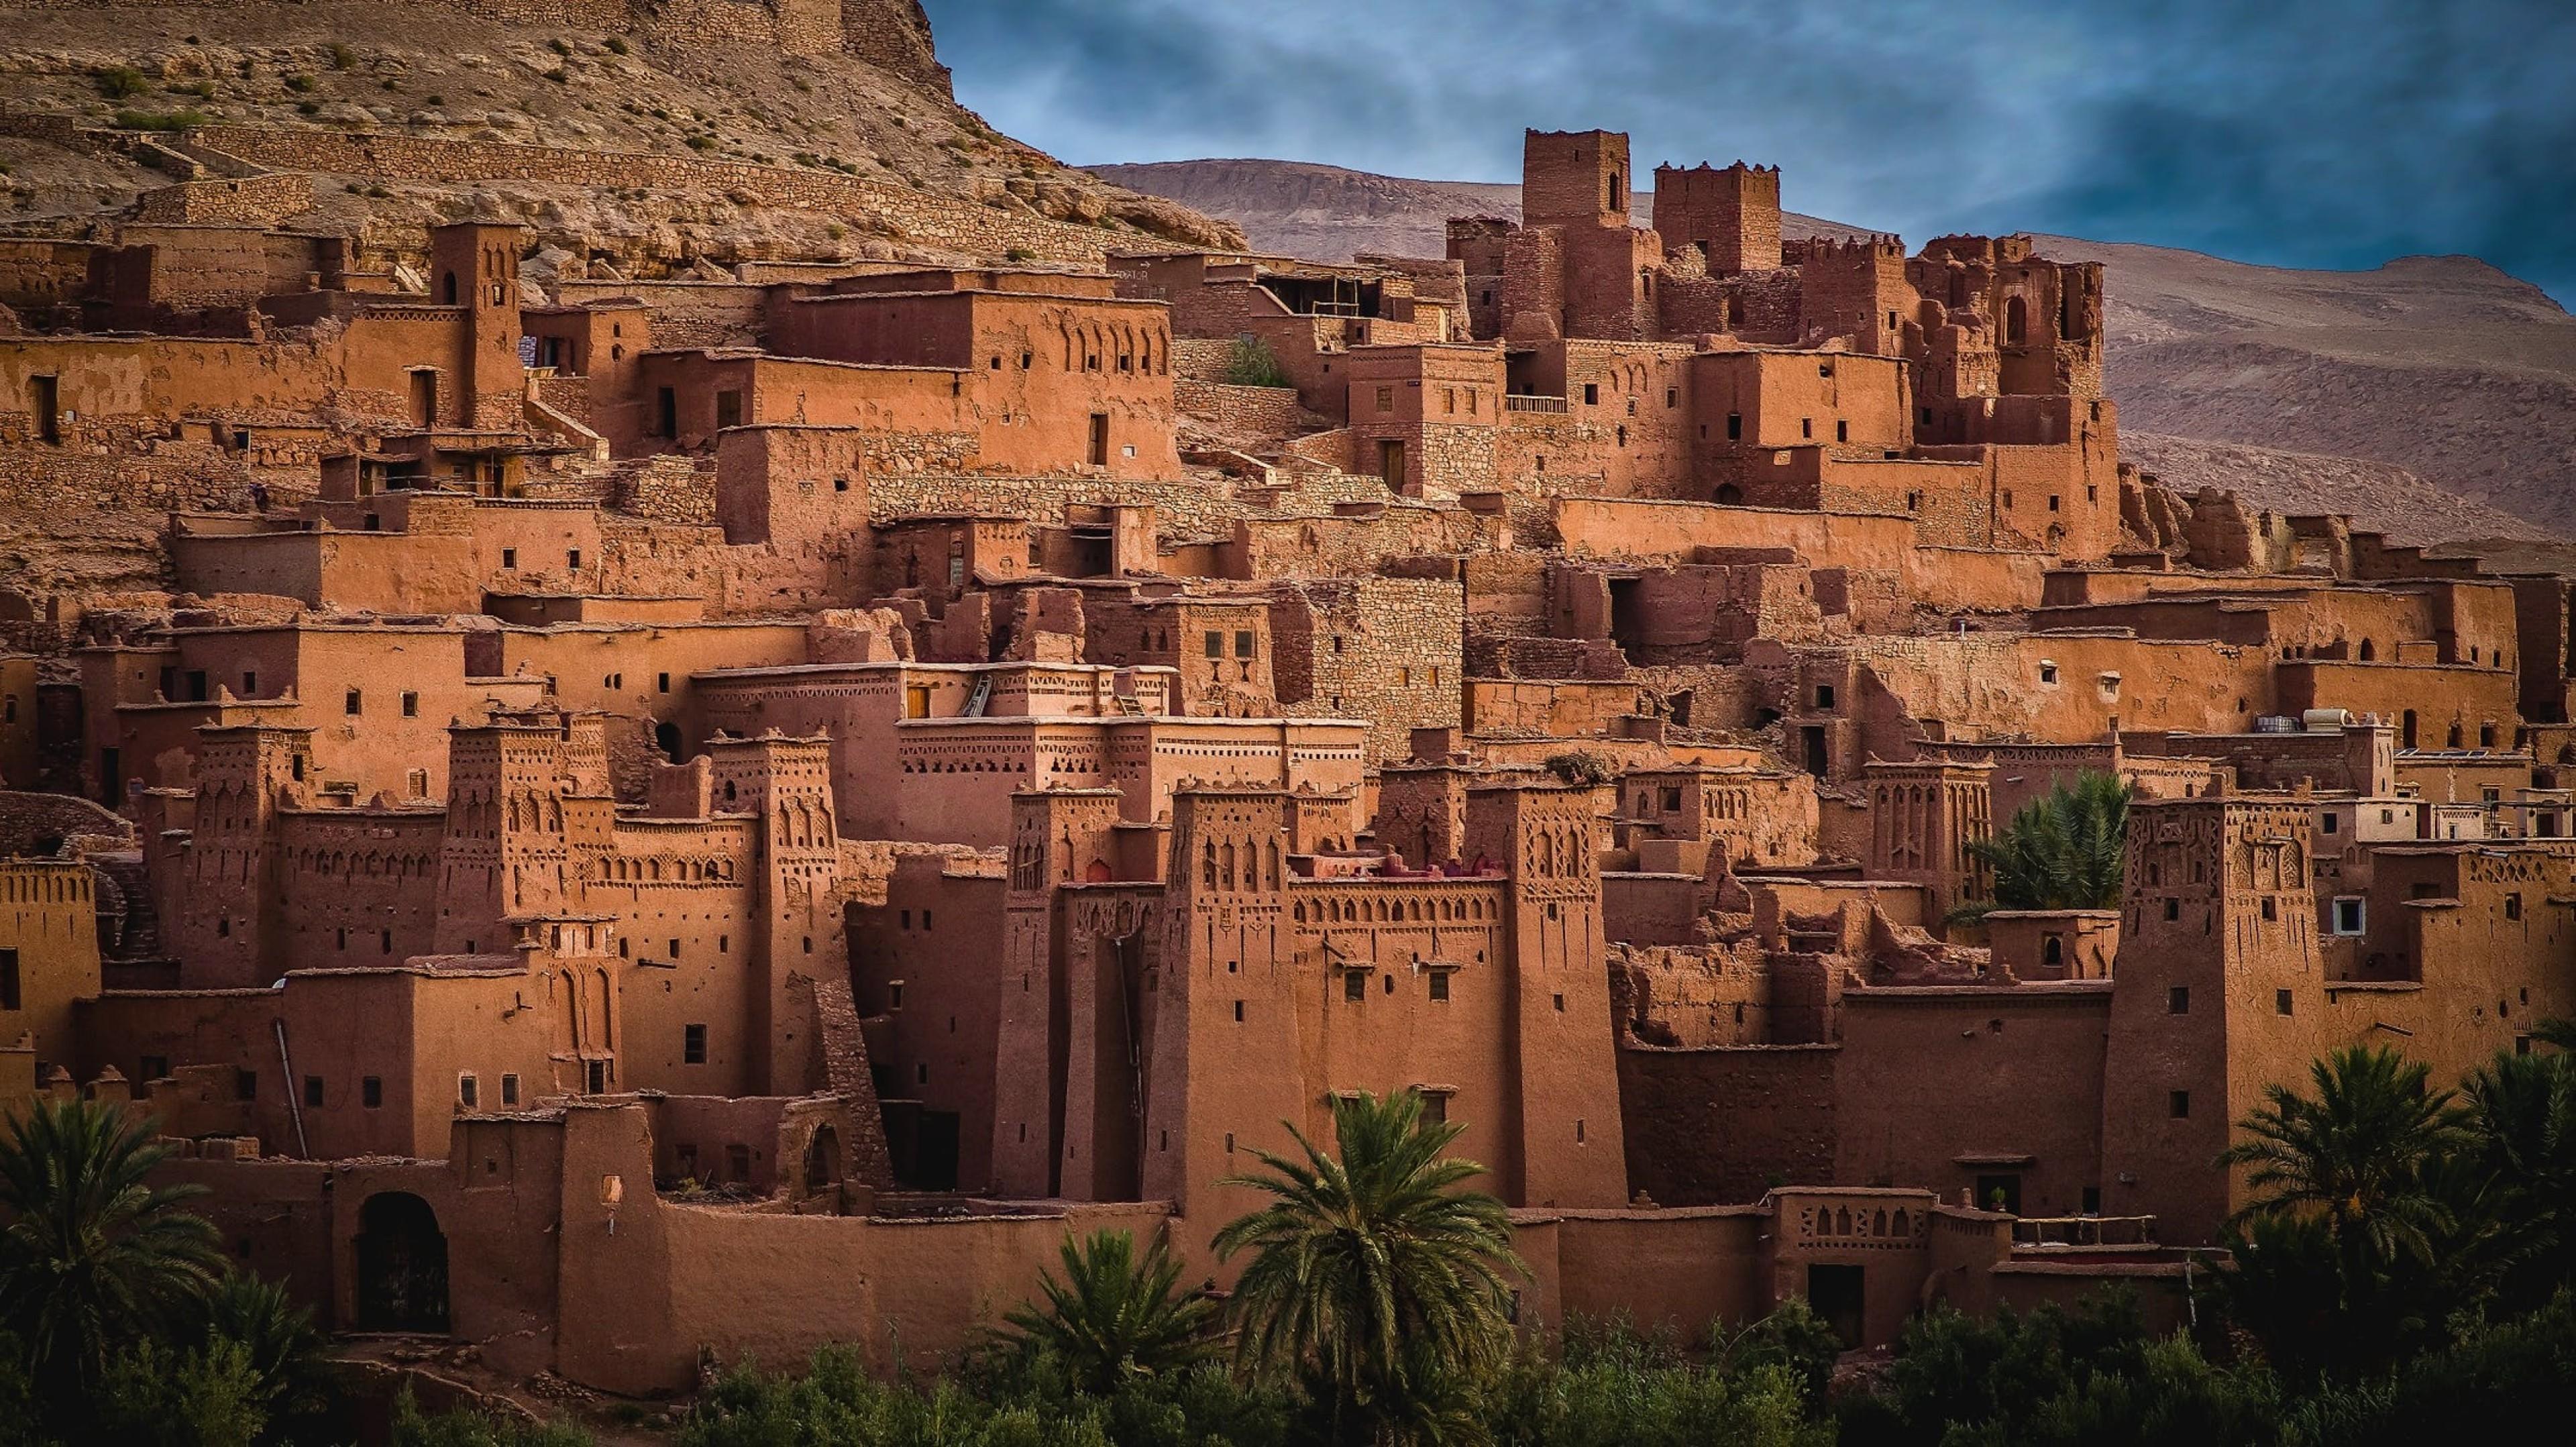 Morocco, what you sayin?